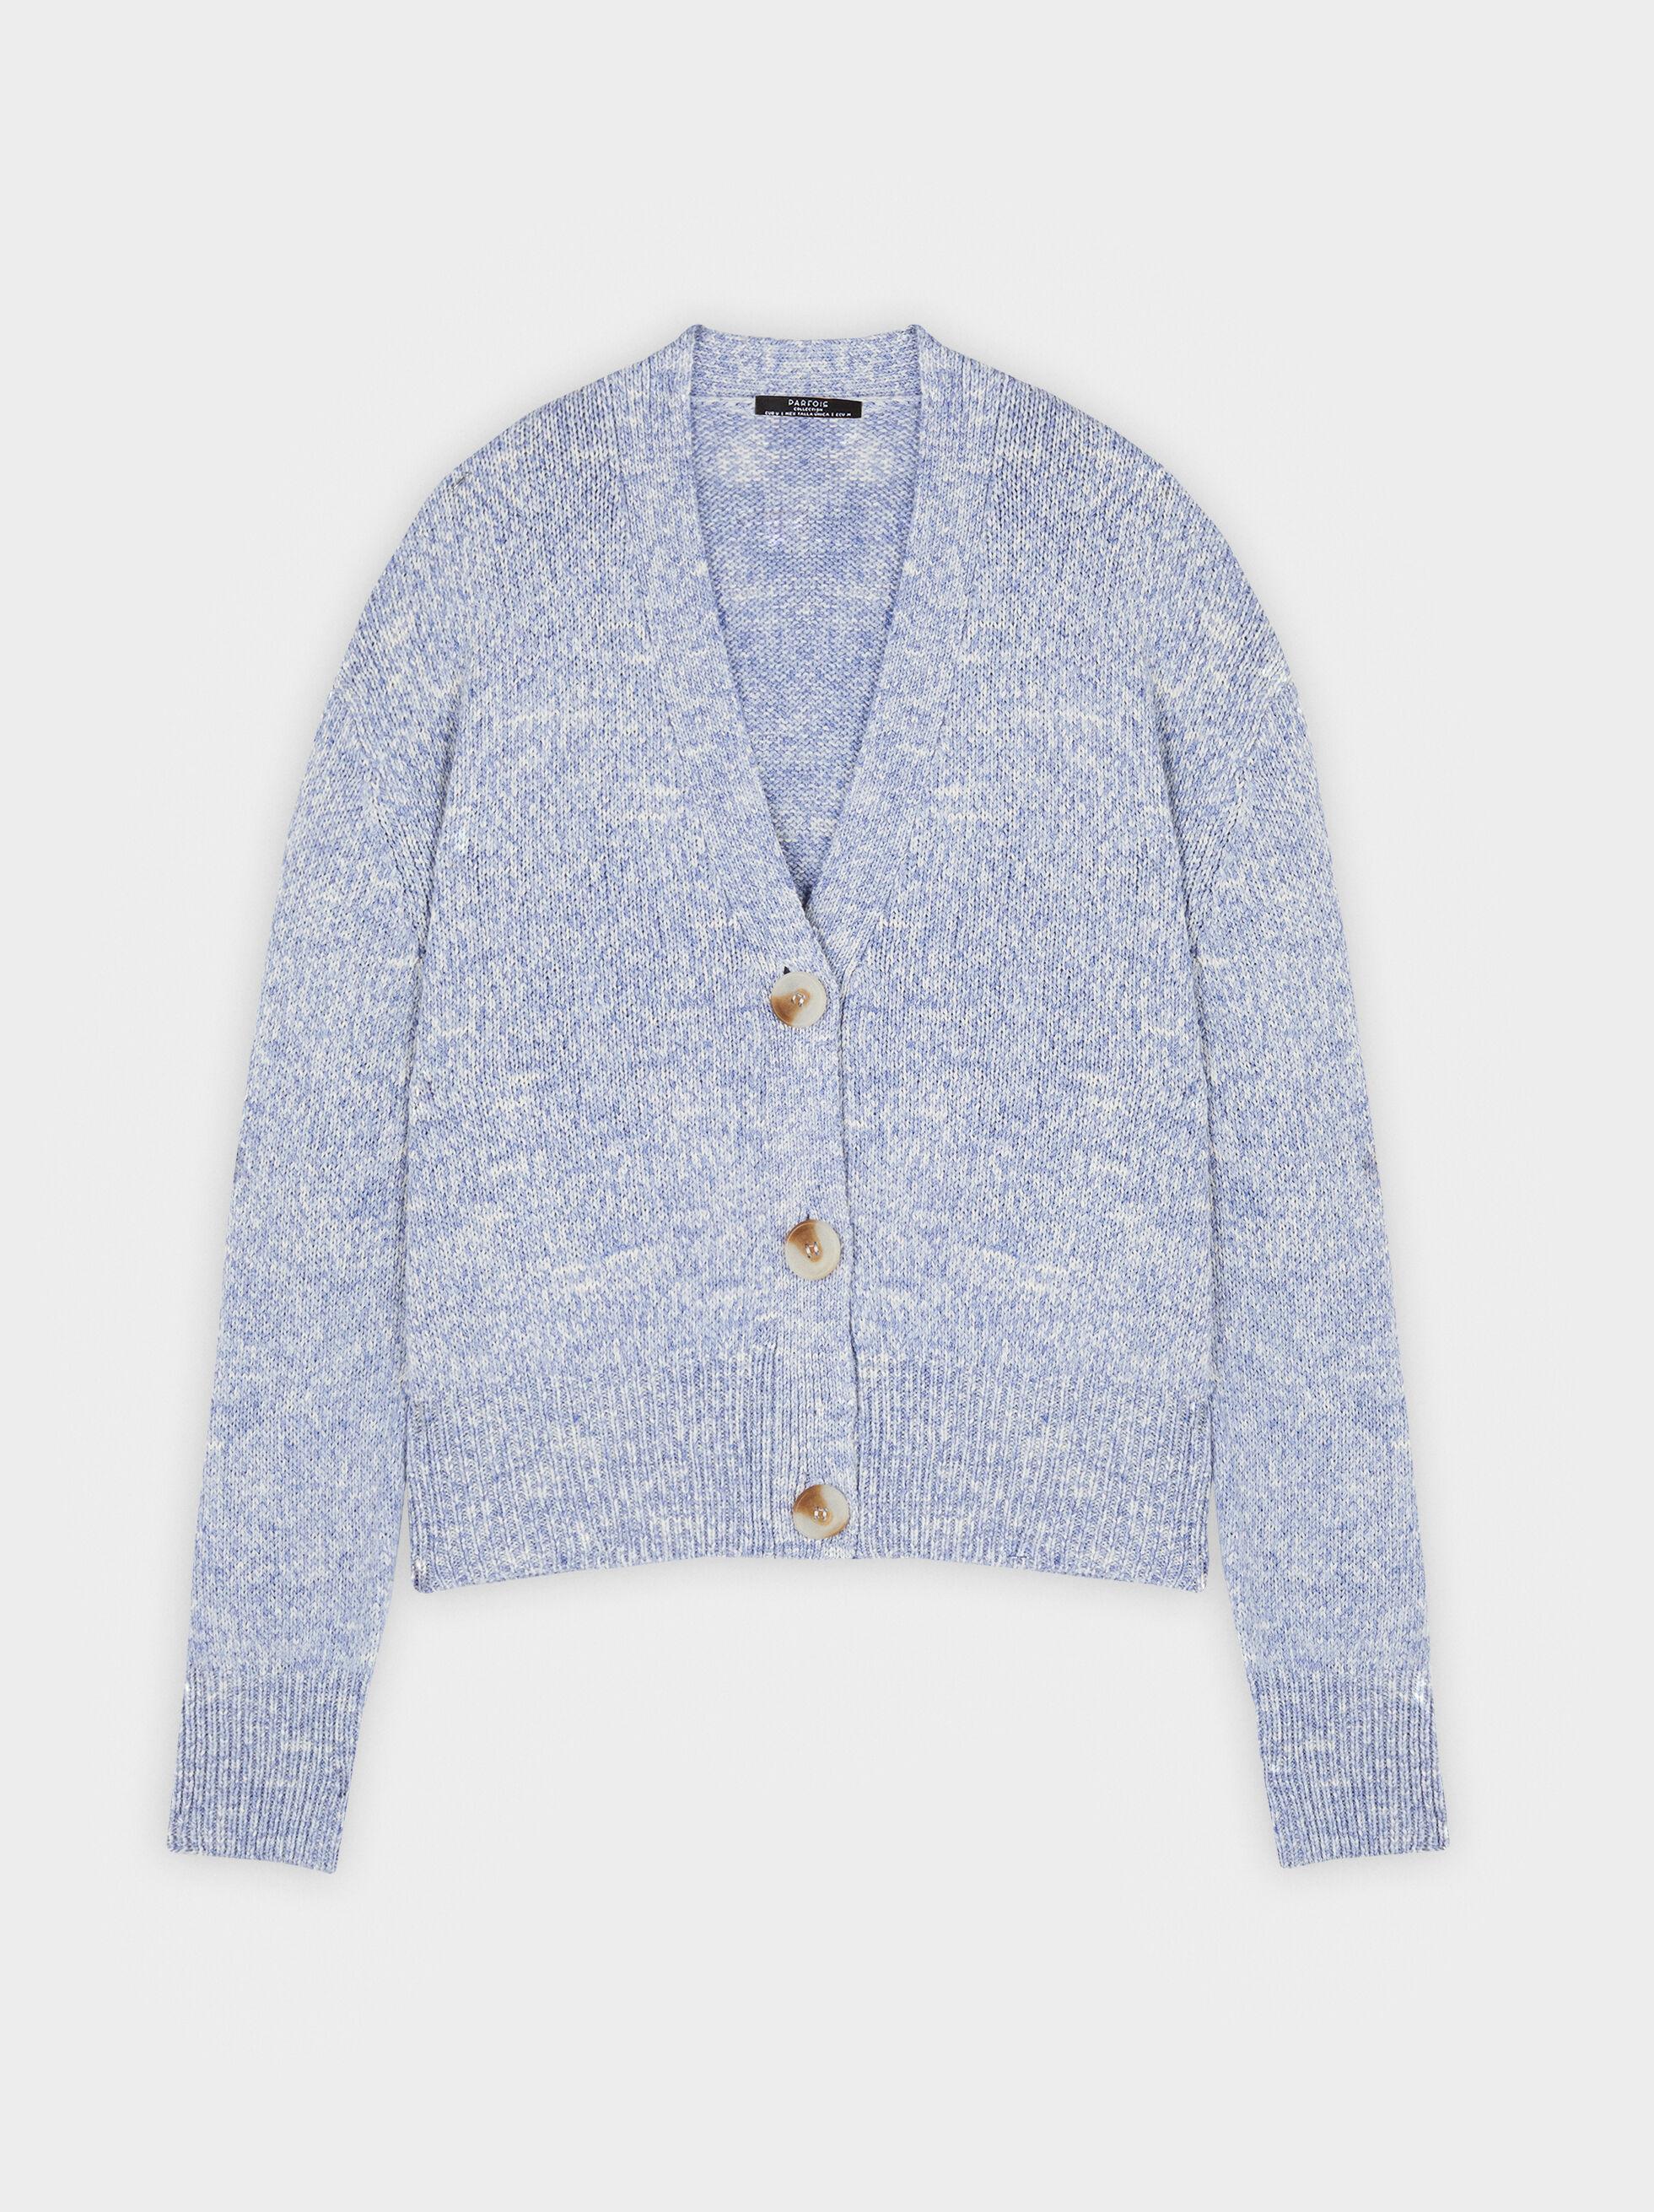 Mottled Knit Cardigan